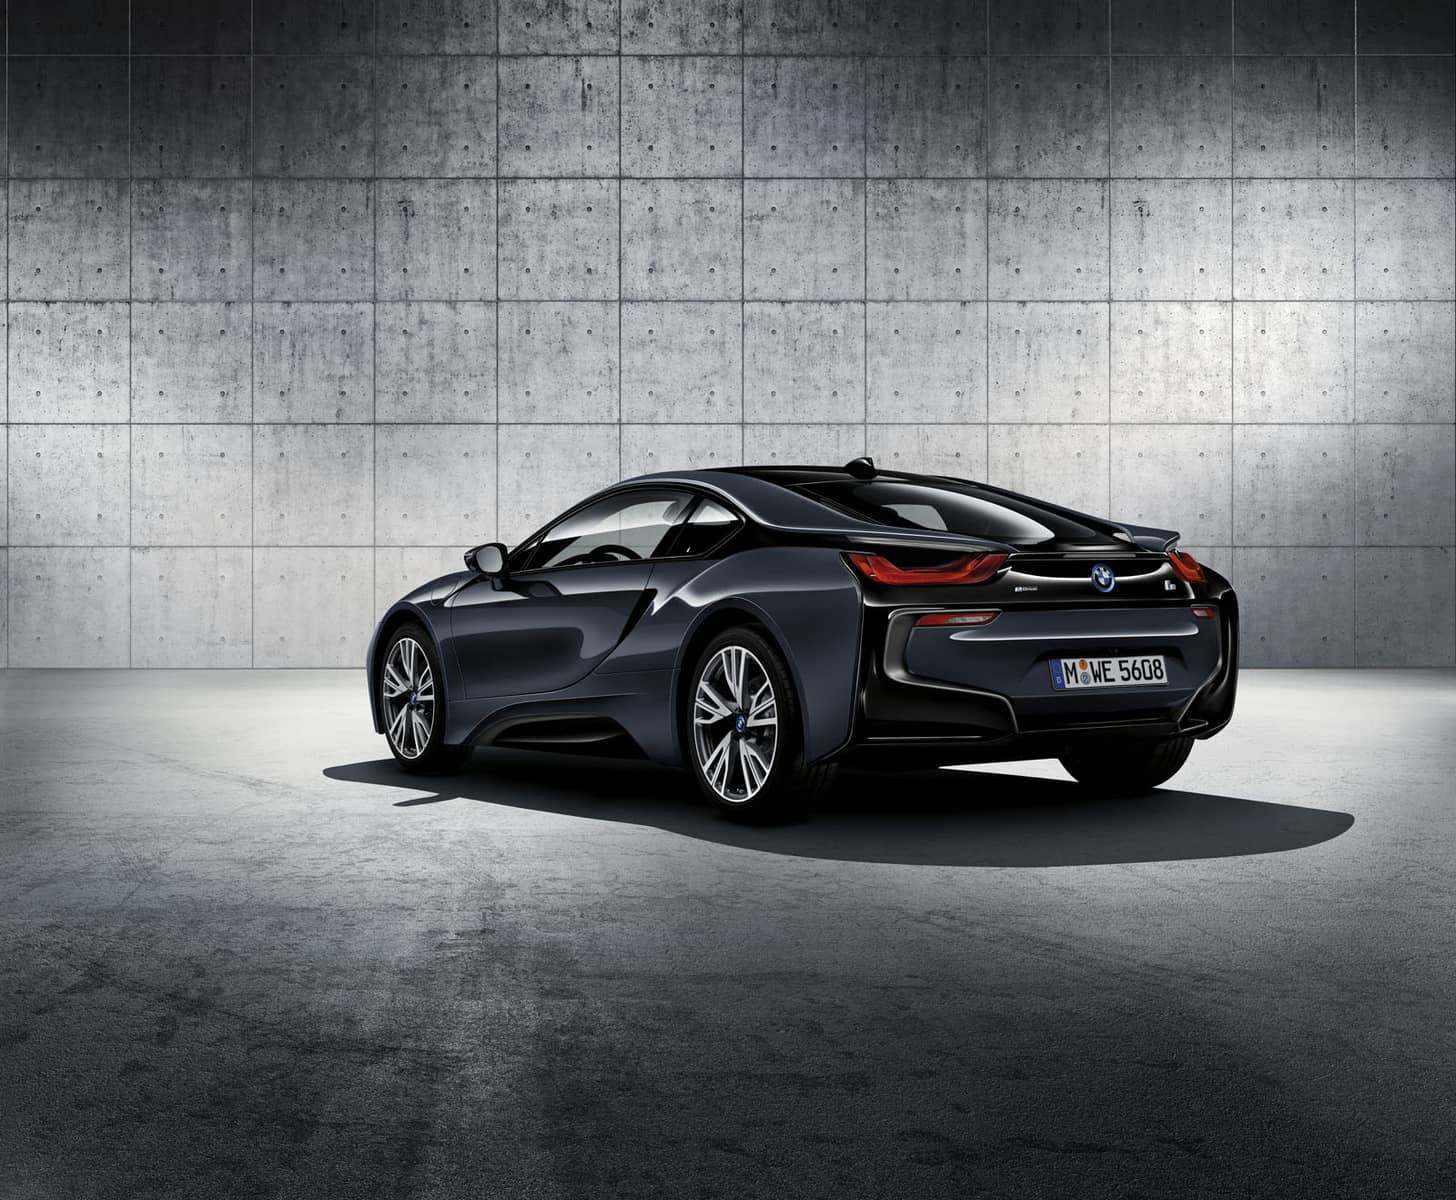 BMW i8 Protonic Silver Edition